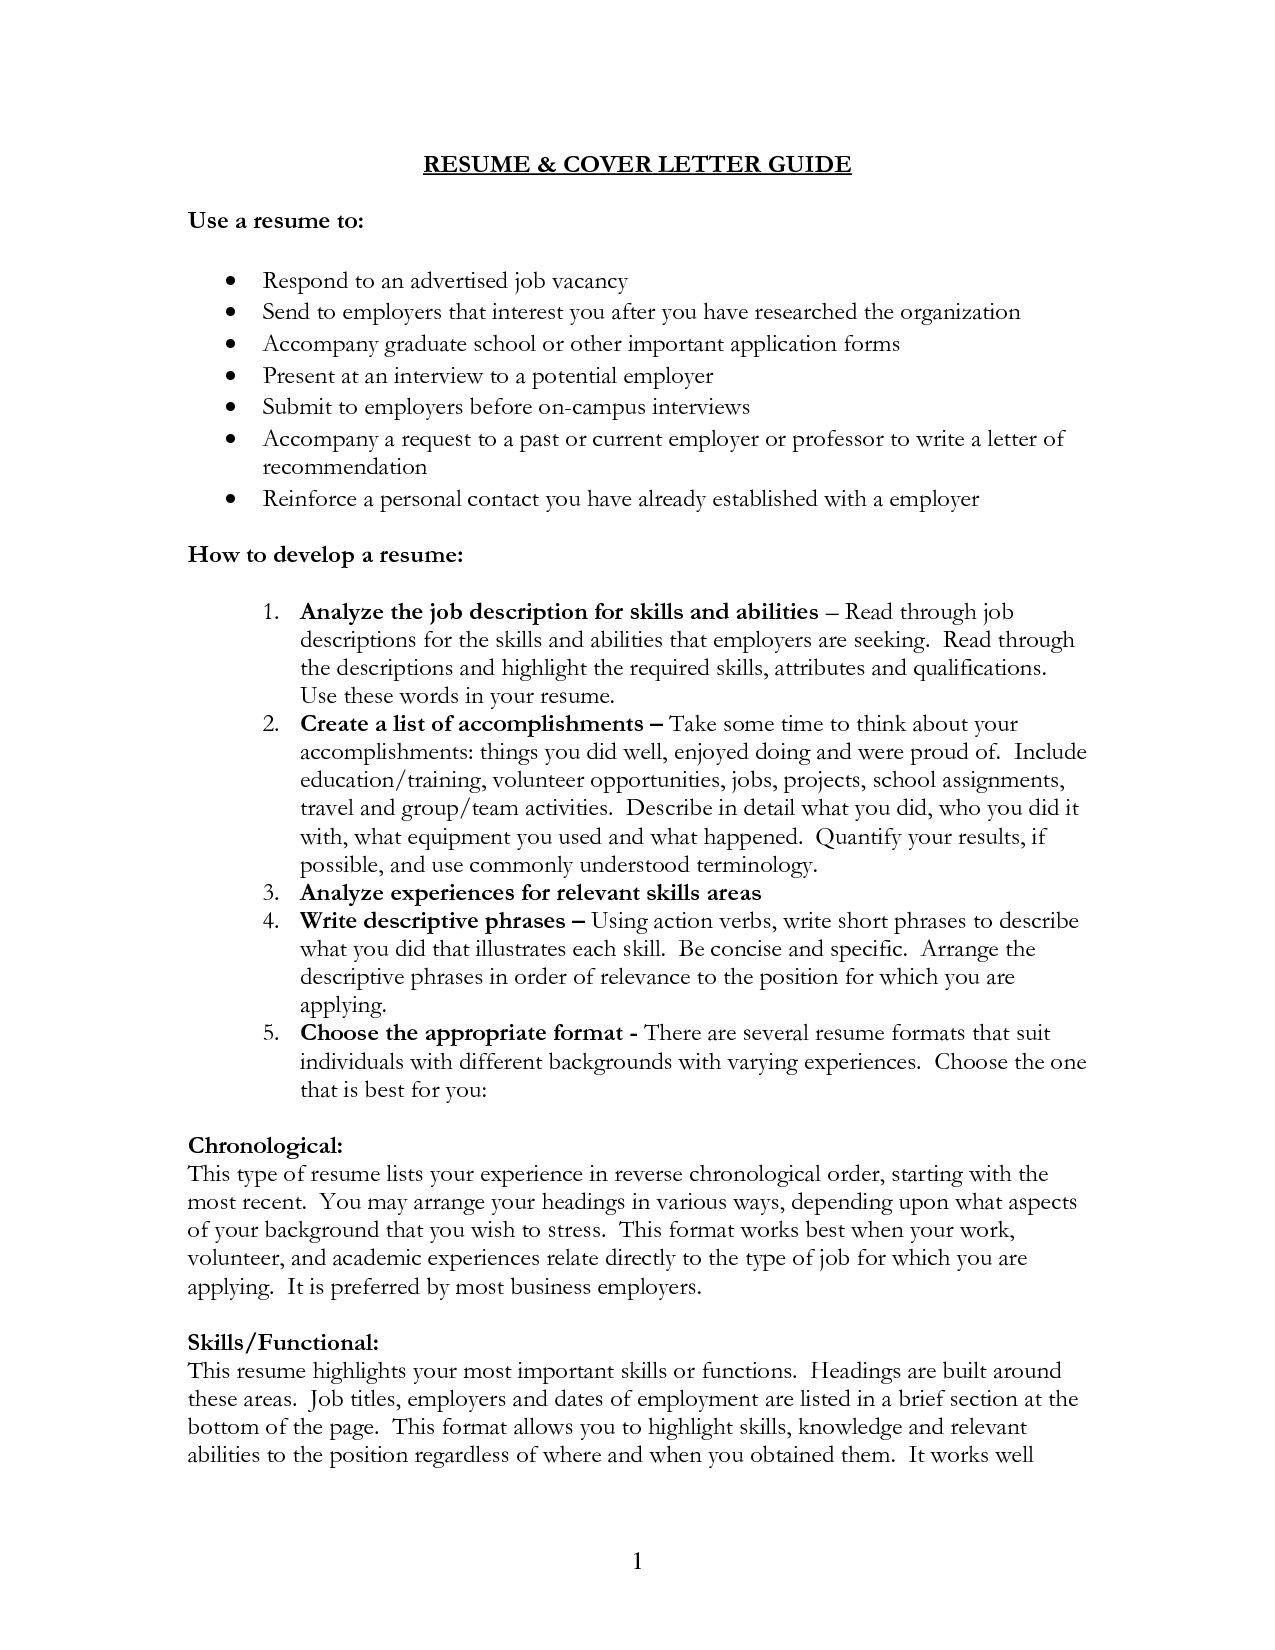 cover letter for applying cabin crew